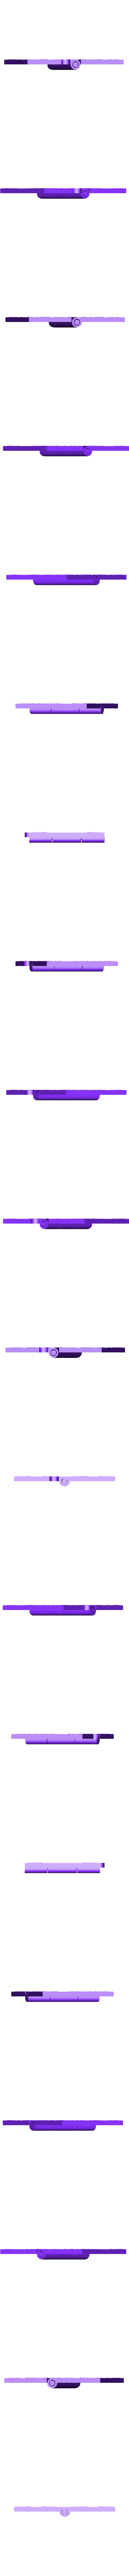 all.stl Download free STL file Memory book - lithophane • Design to 3D print, mrbarki7